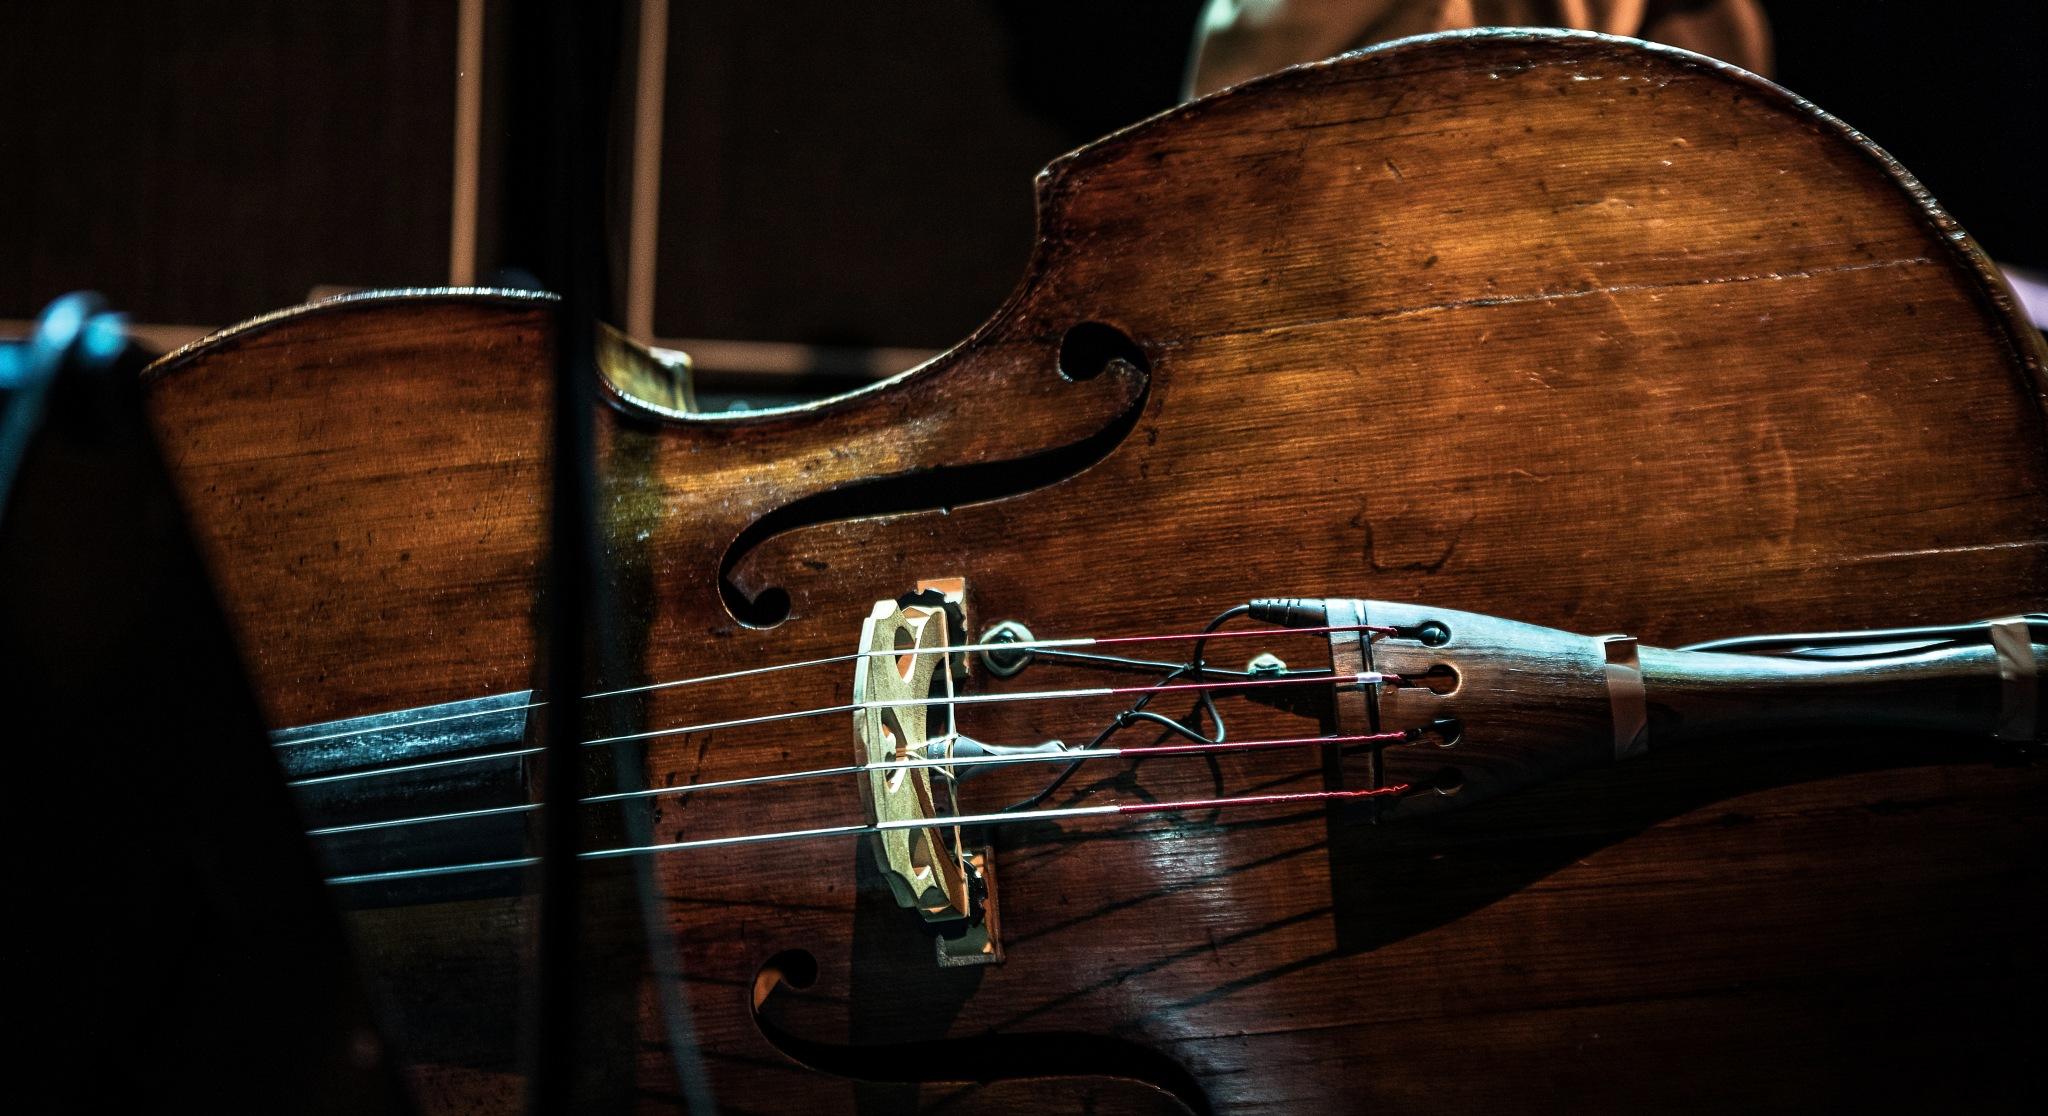 Jazz on A Contrabass. by GiekeMerckx